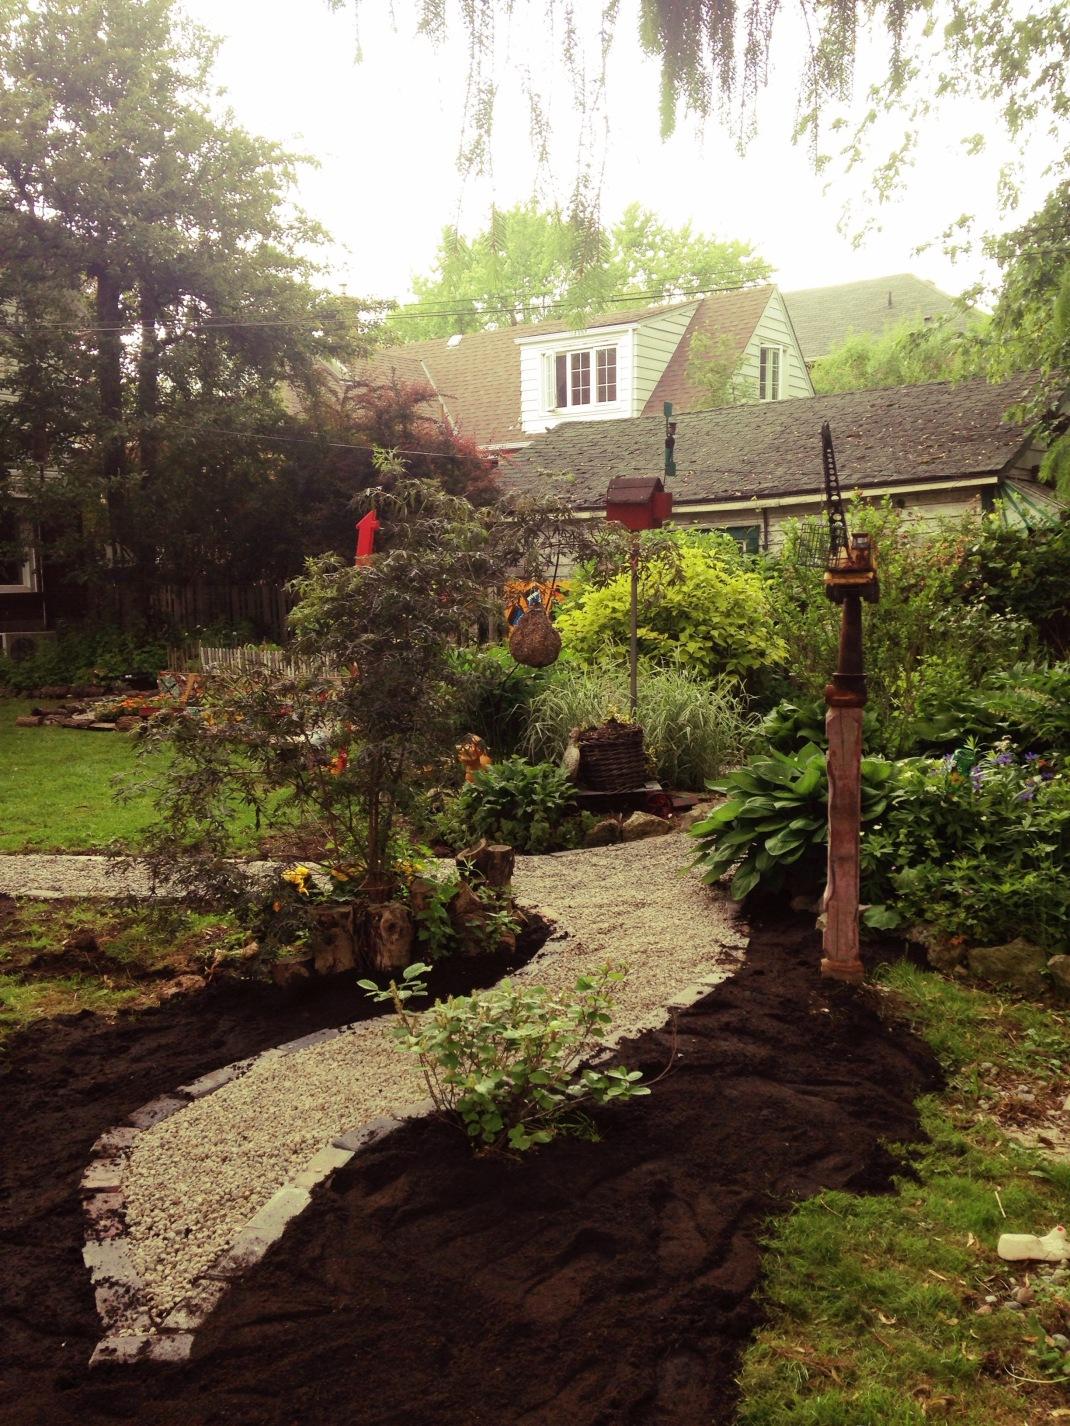 Lead me down that garden path | 27th Street